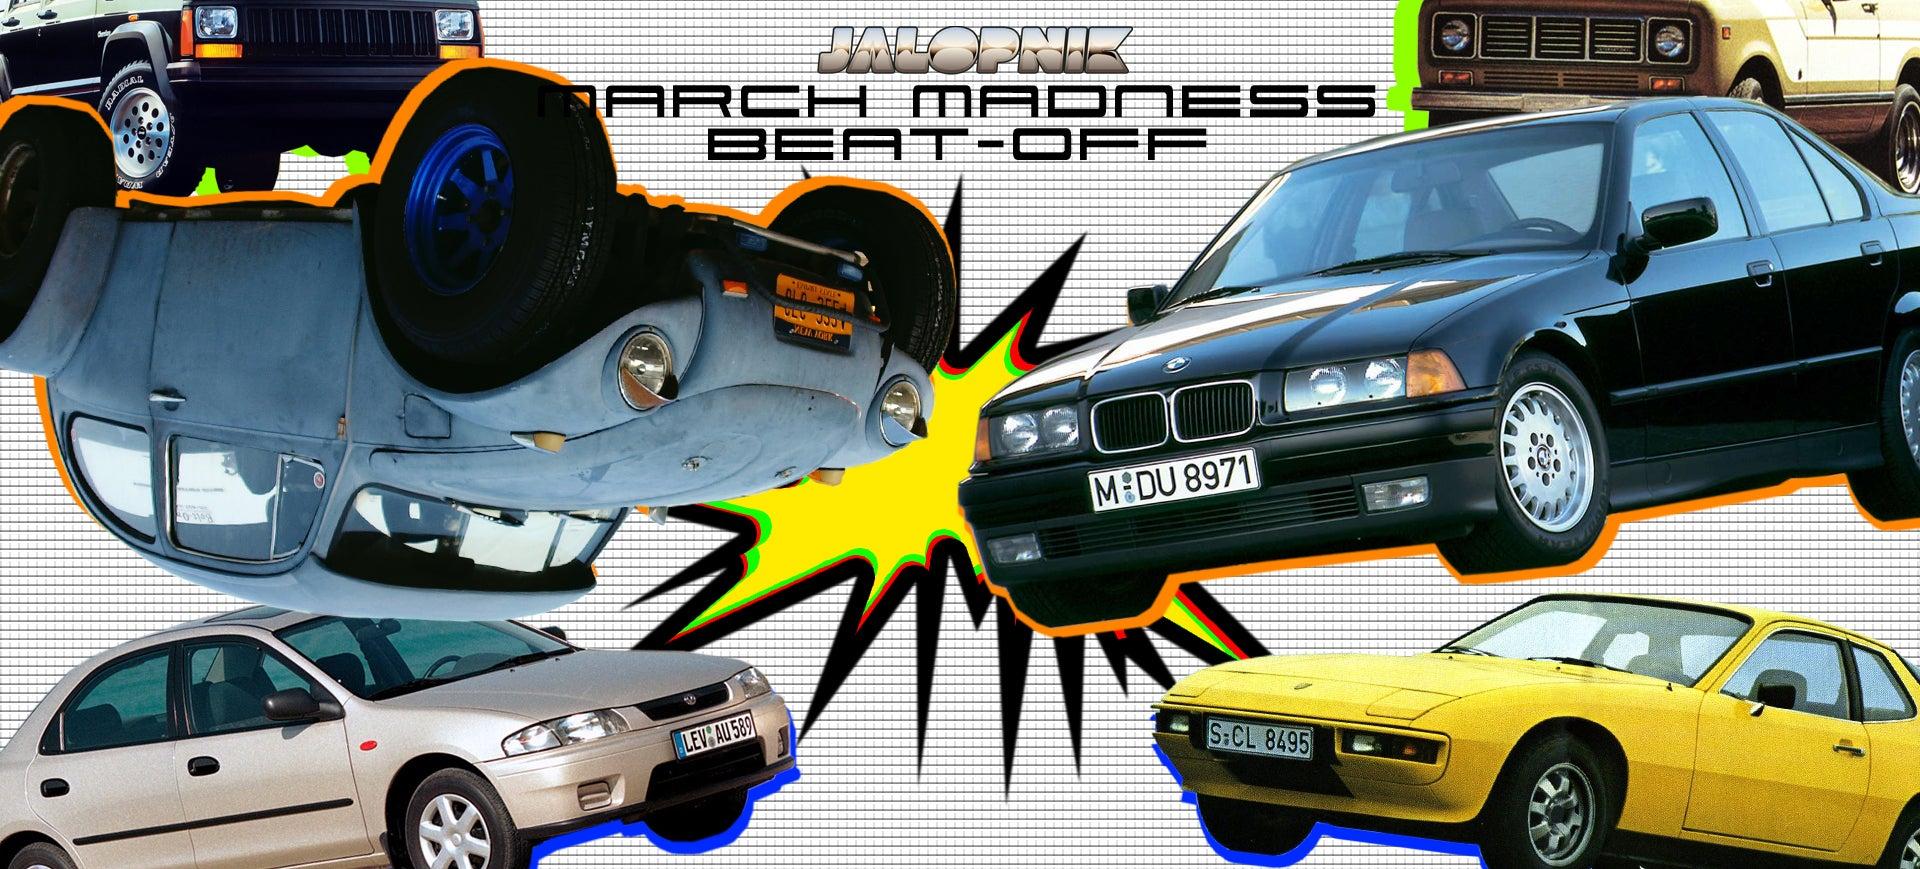 The Jalopnik March Madness BeatOff Round 4  Resurrection